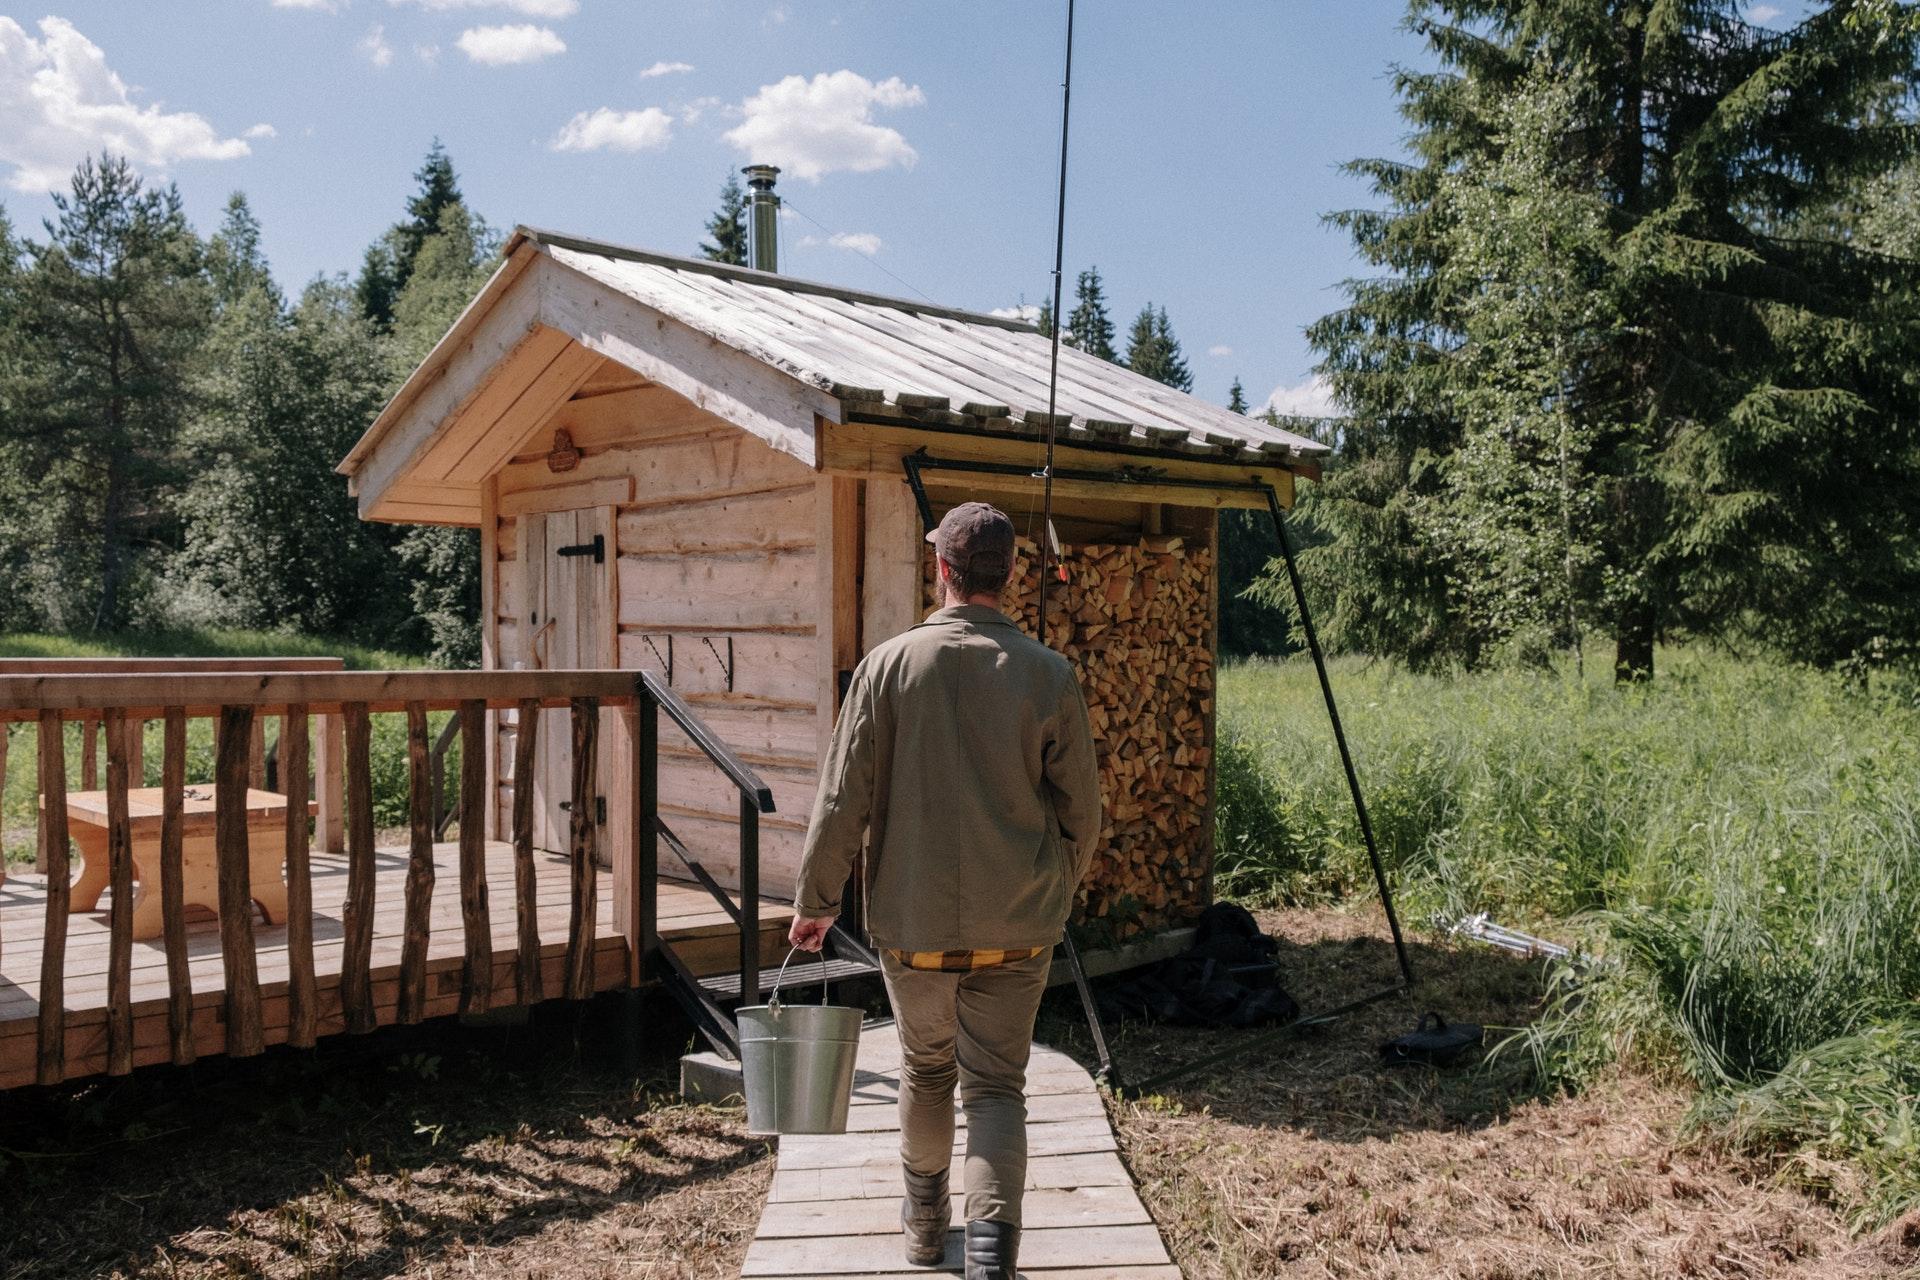 Podnošenje zahteva za IPARD Meru 7 podsticaje za ruralni turizam do 30. oktobra